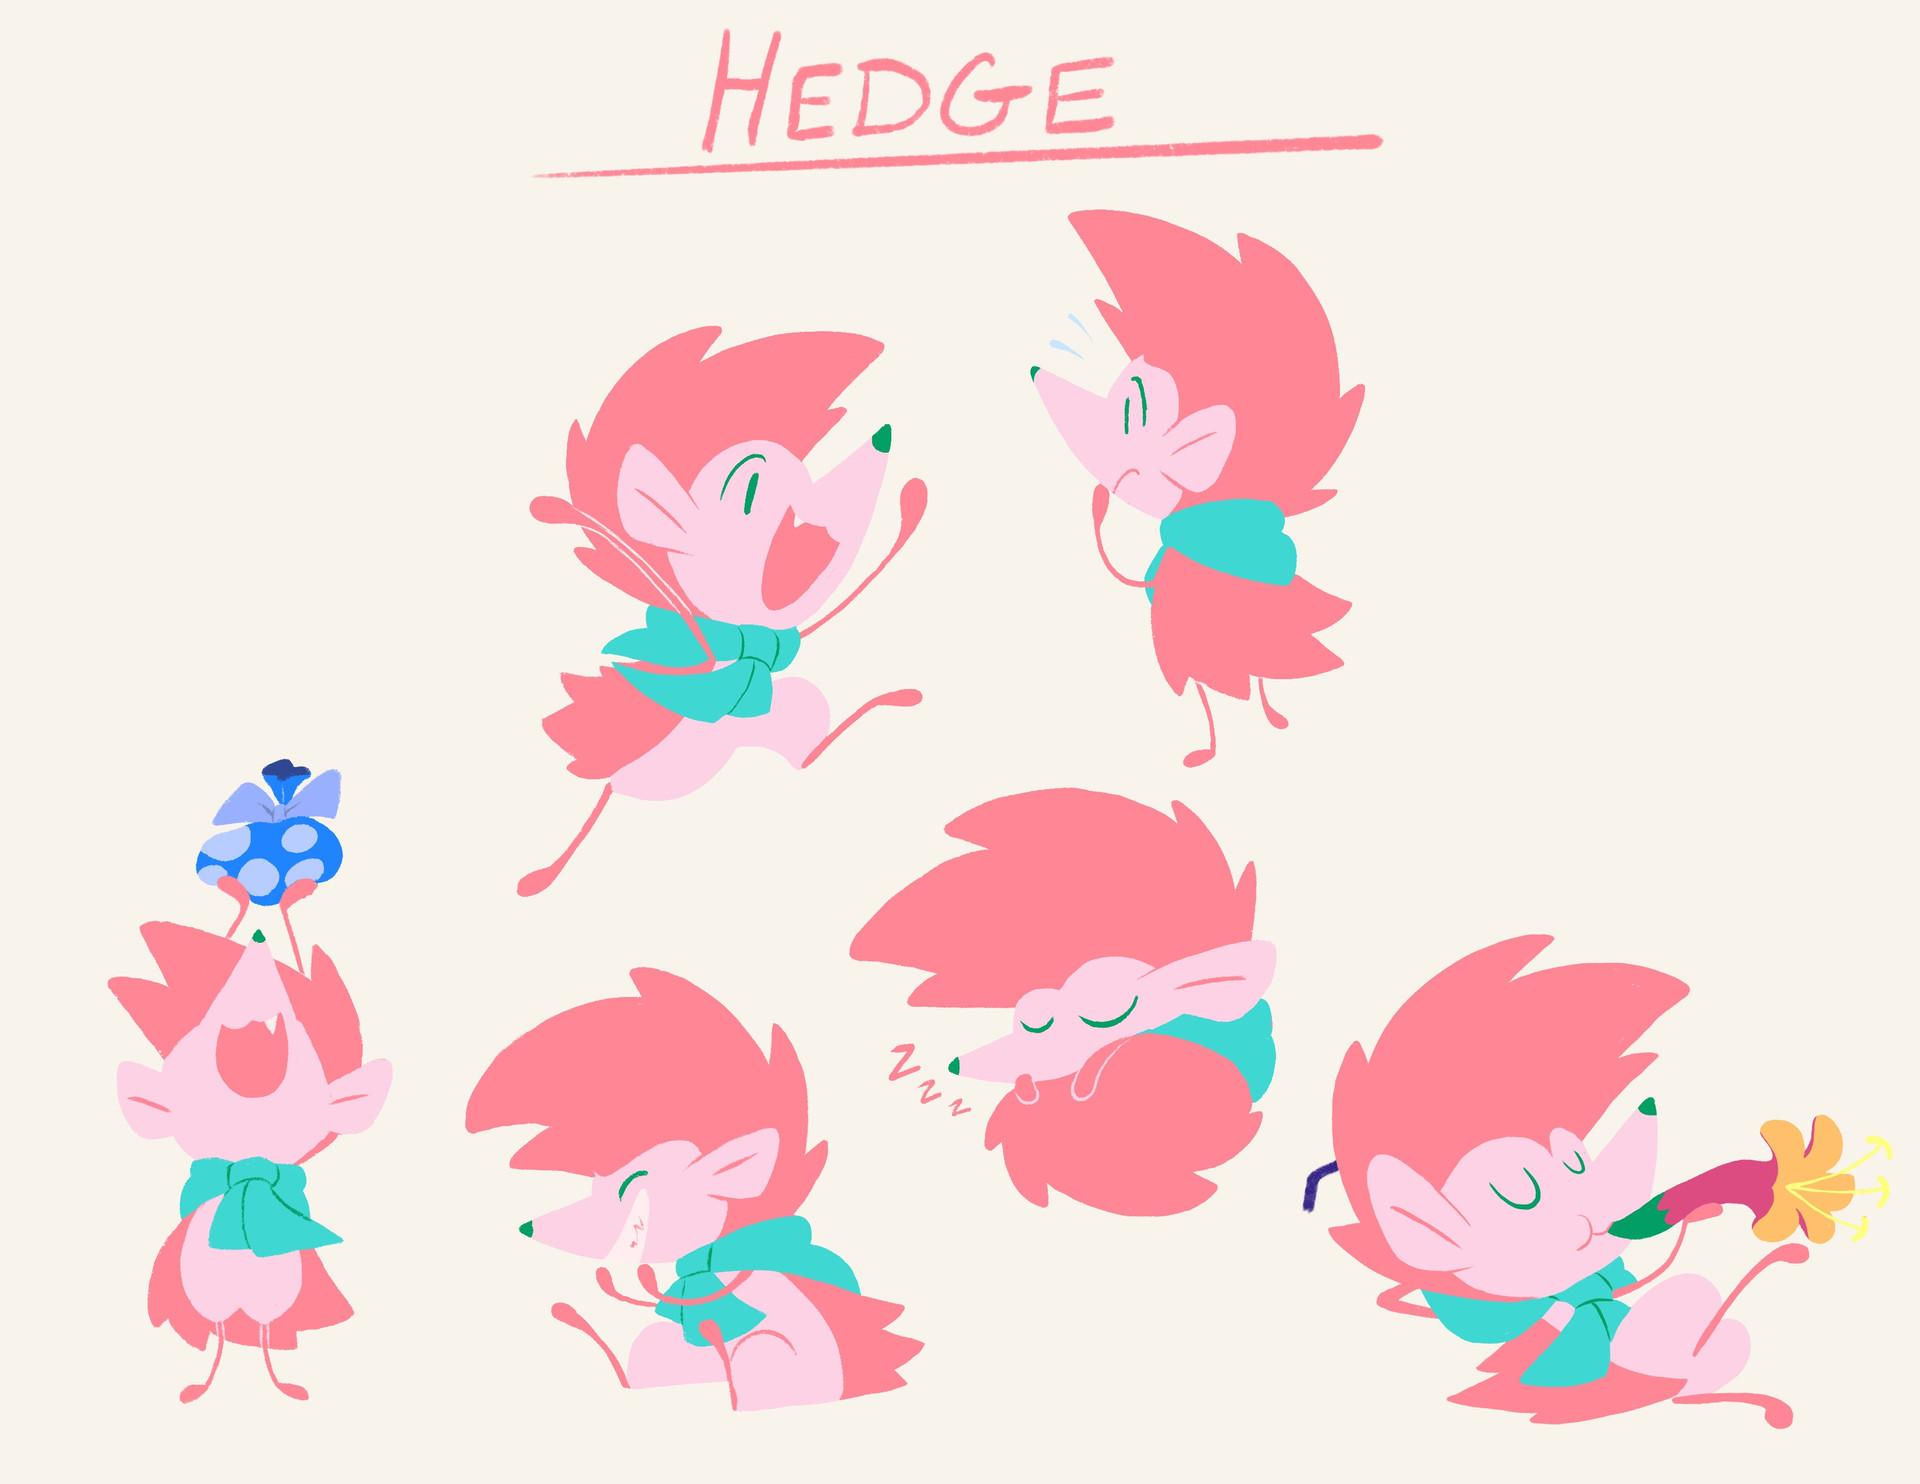 HP_-_Pitch_-_Hedge.jpg